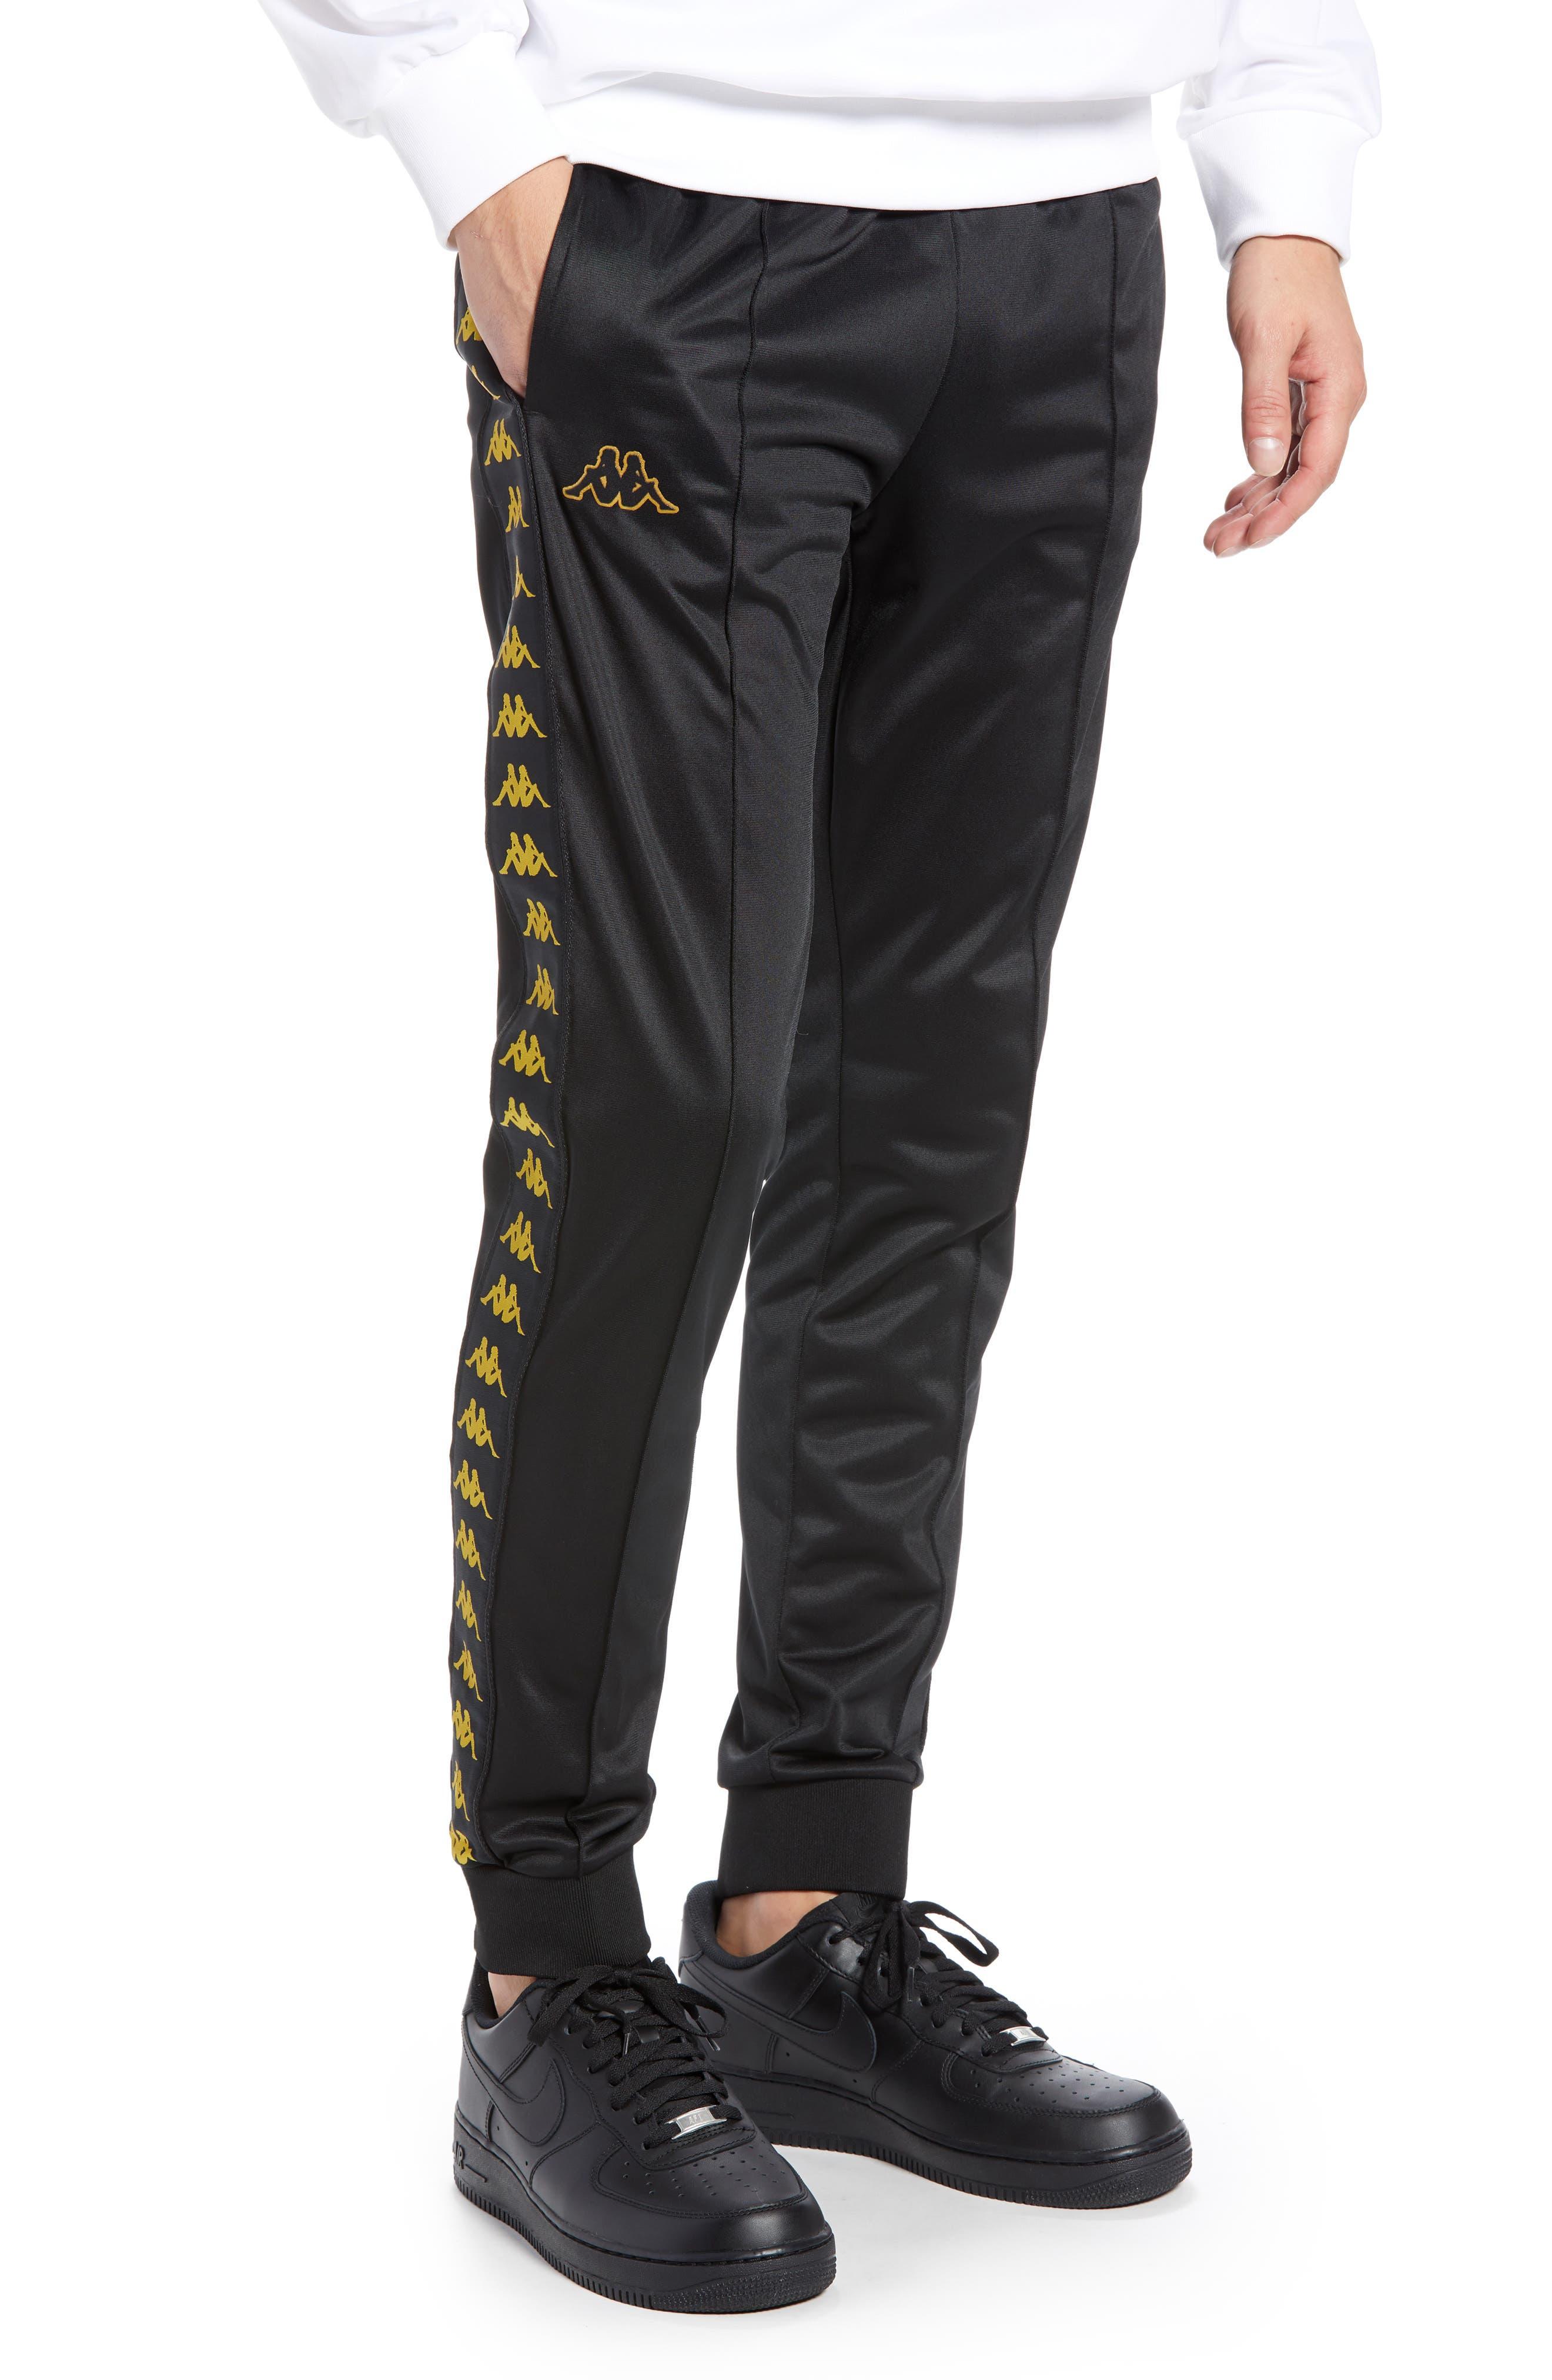 Active Banded Track Pants,                             Main thumbnail 1, color,                             BLACK/ GOLD